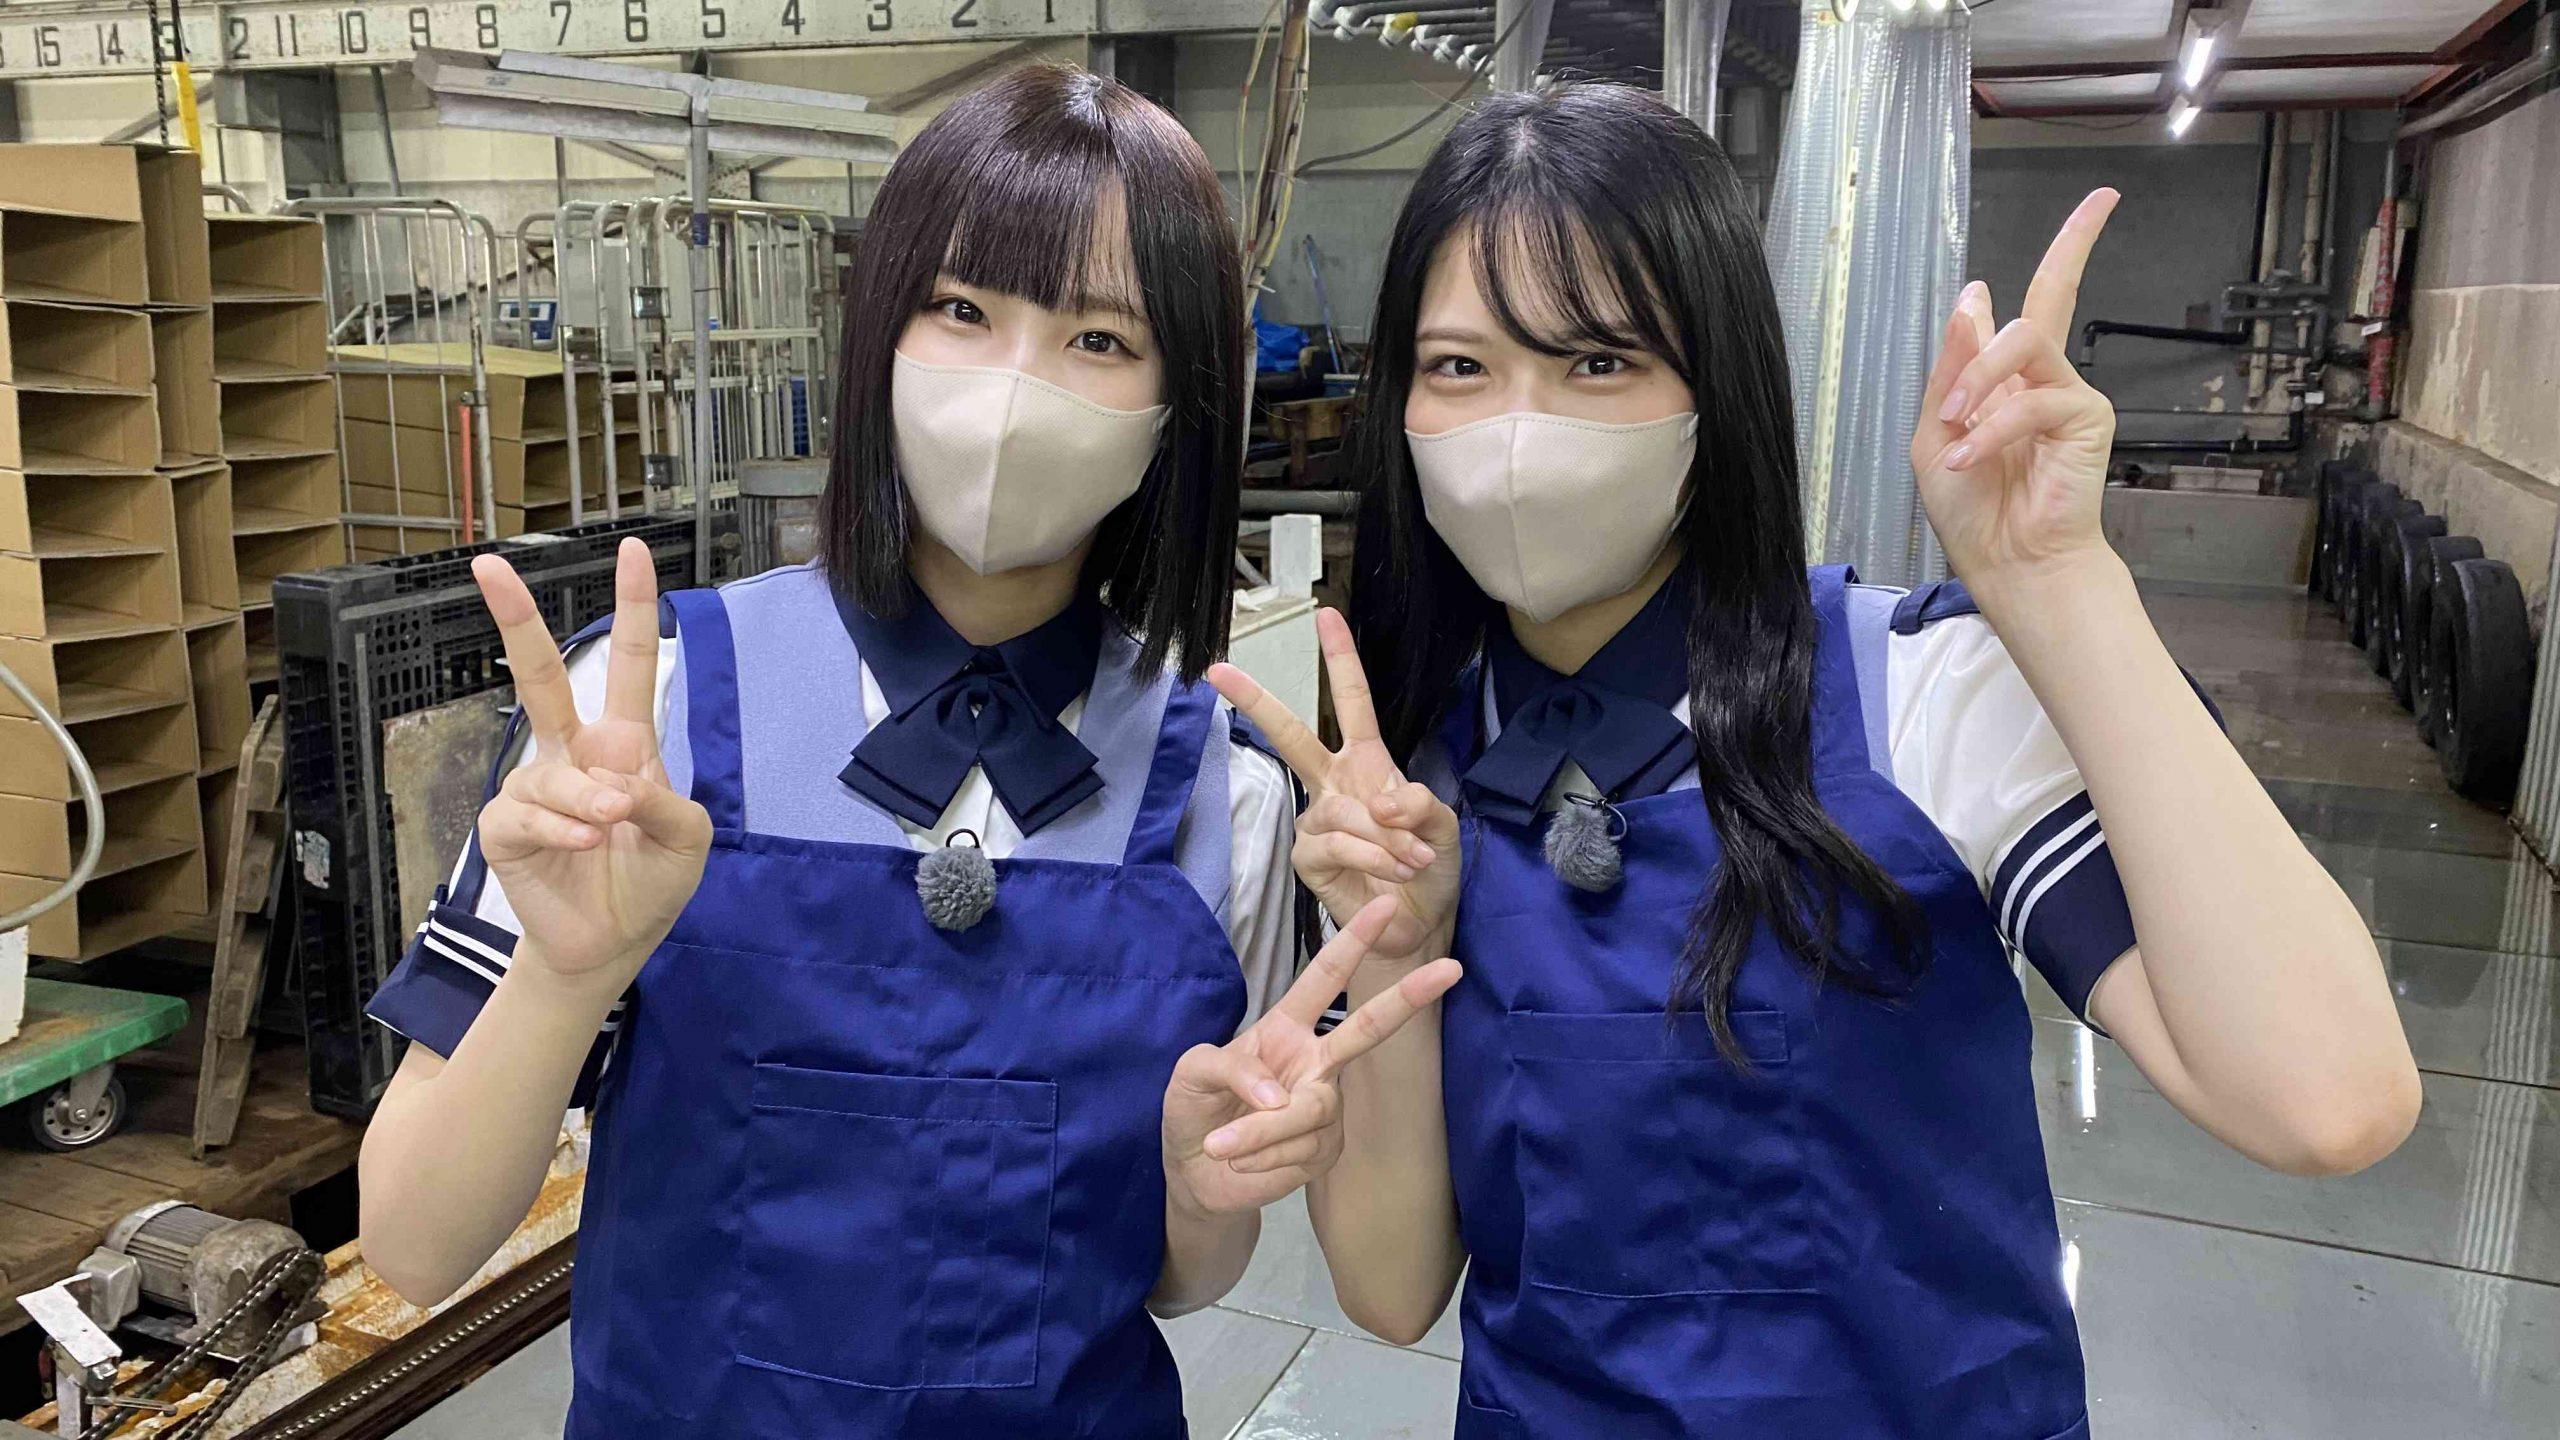 STU48沖侑果・矢野帆夏が氷彫刻にチャレンジ